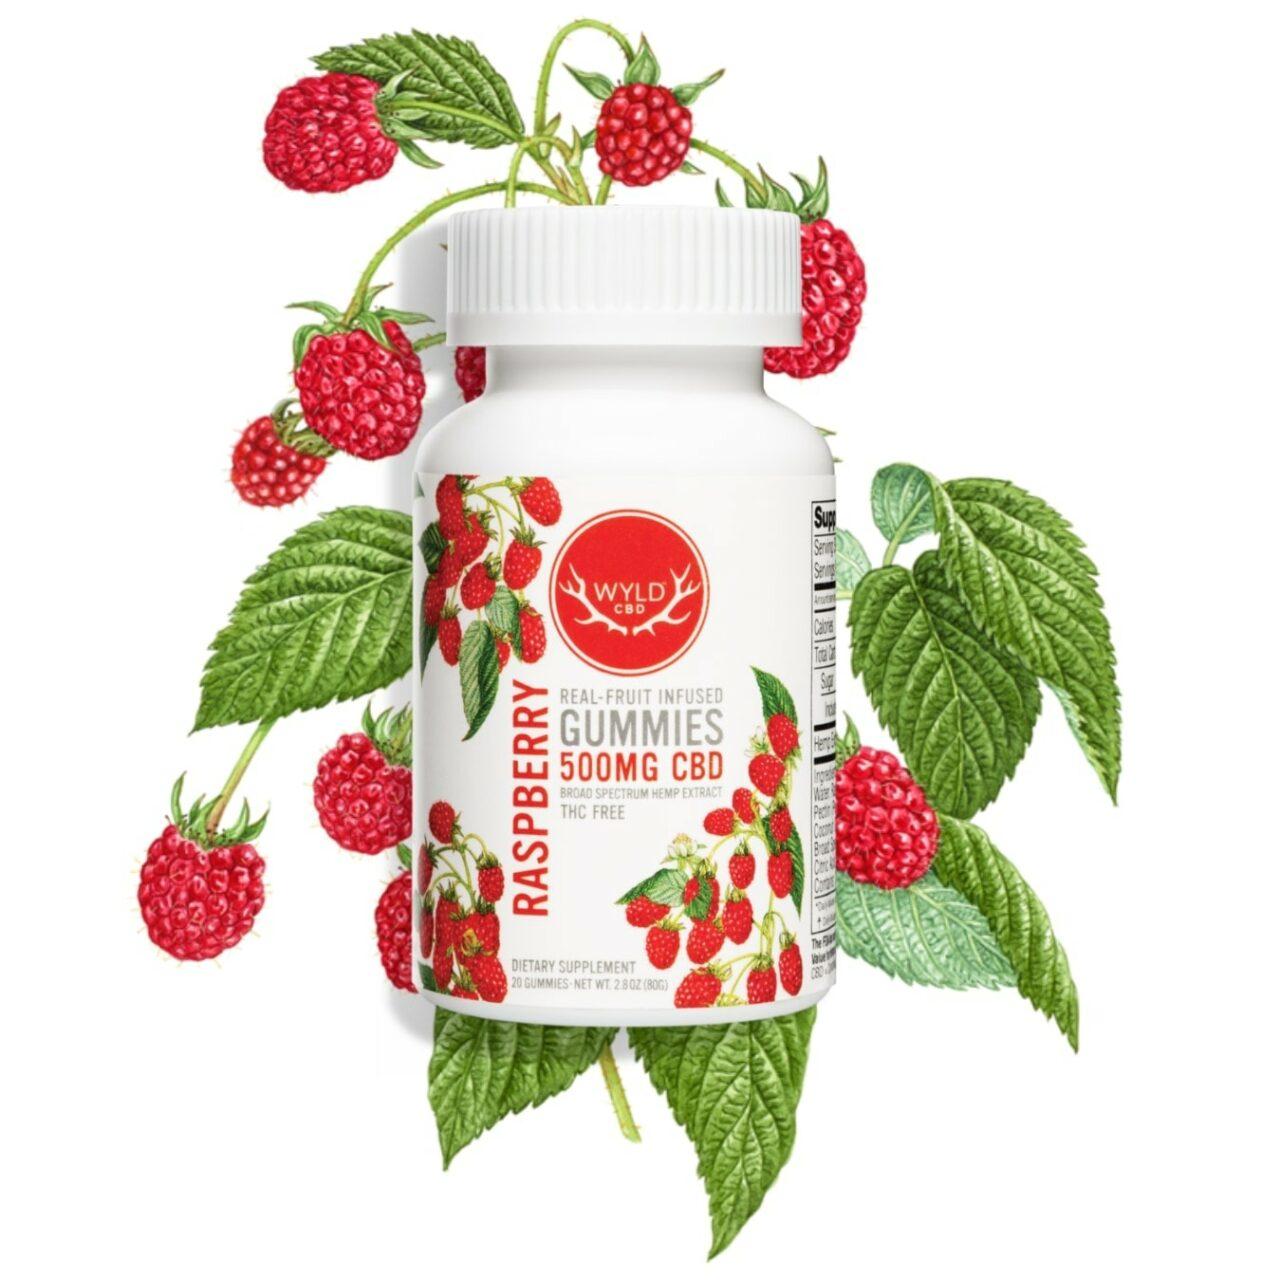 Wyld CBD, Raspberry Gummies, Broad Spectrum THC-Free, 20ct, 500mg CBD3